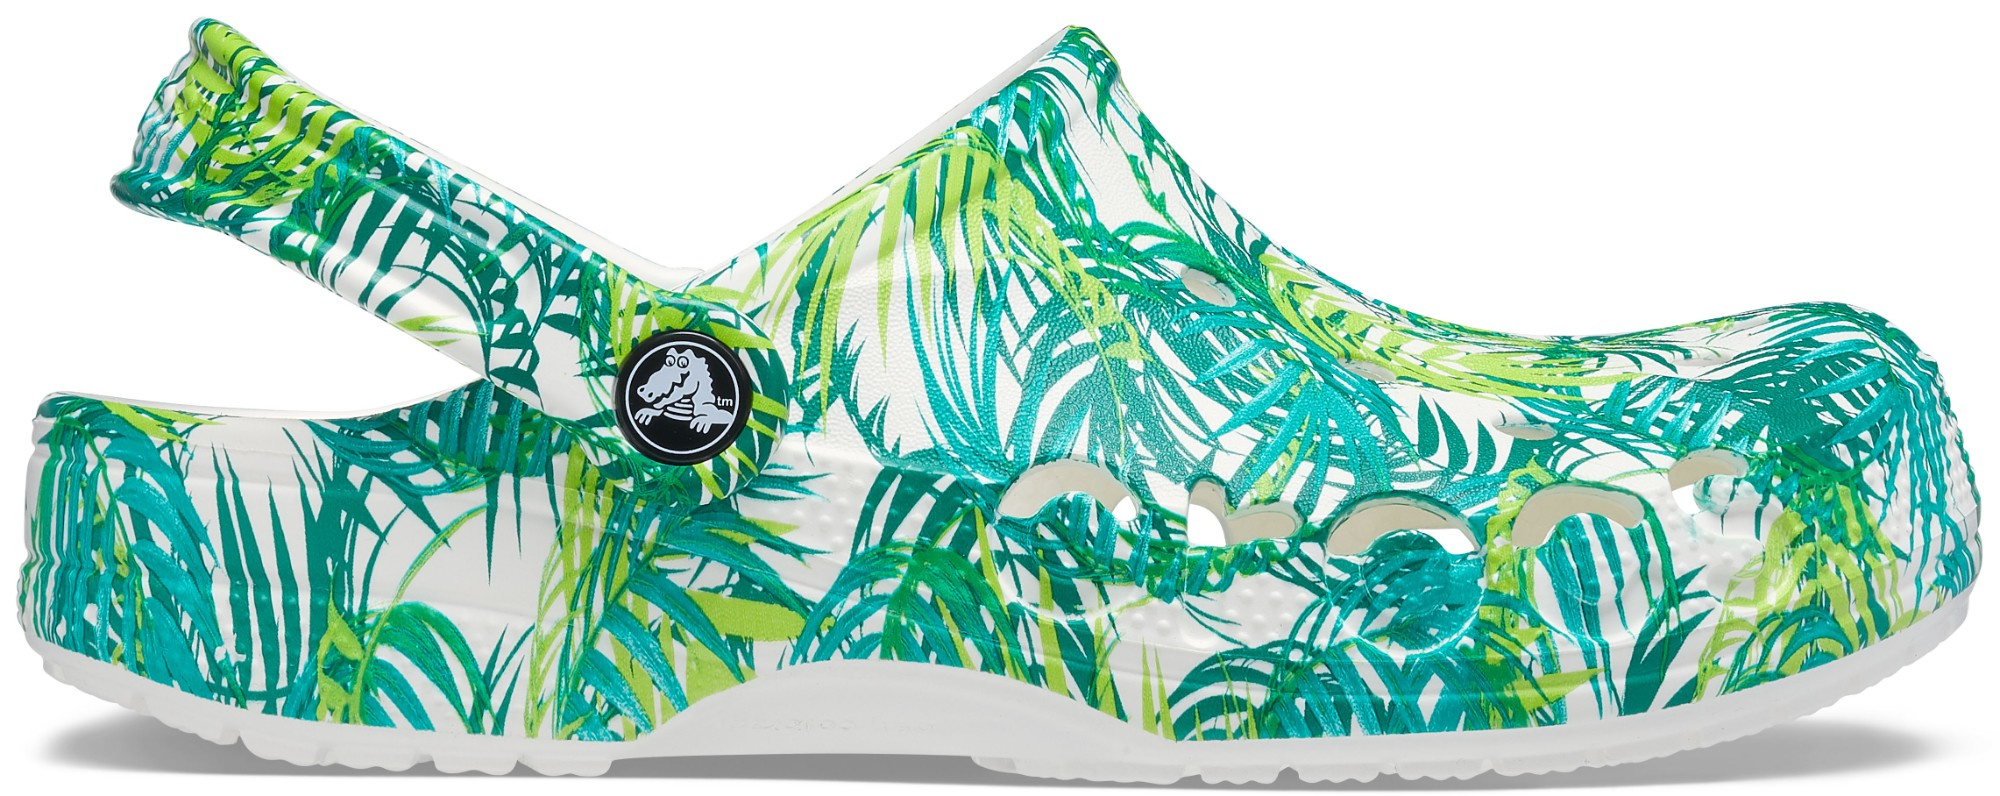 Crocs™ Baya Seasonal Printed Clog White/Tropical 36,5